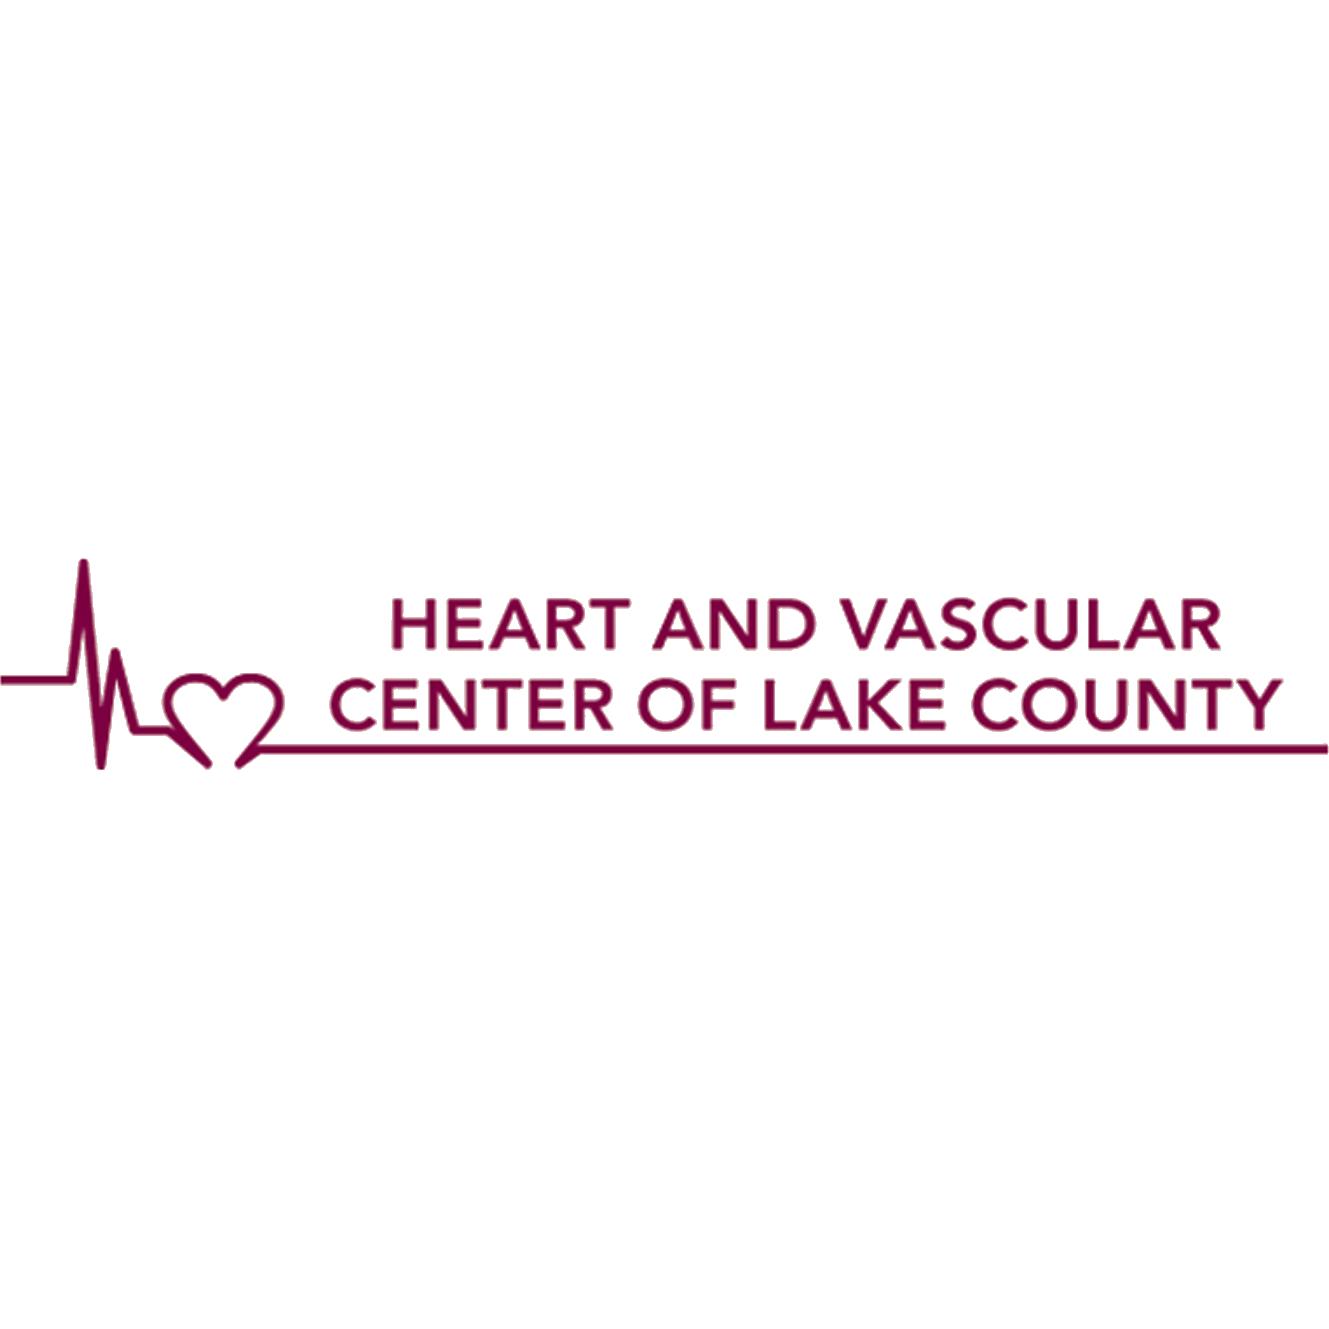 Heart and Vascular Center of Lake County Logo